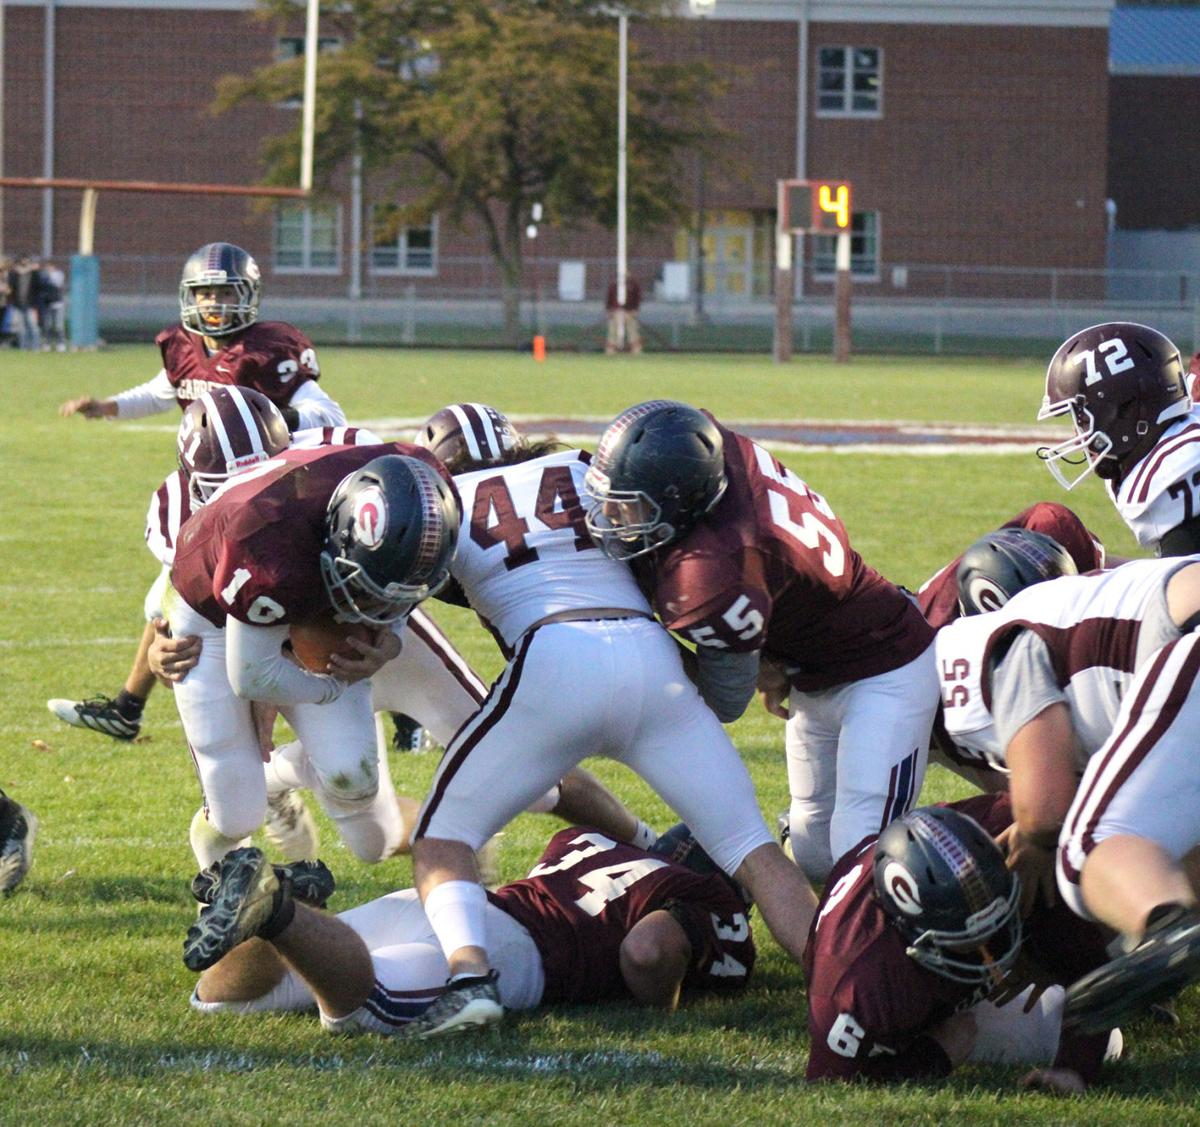 Railroader touchdown